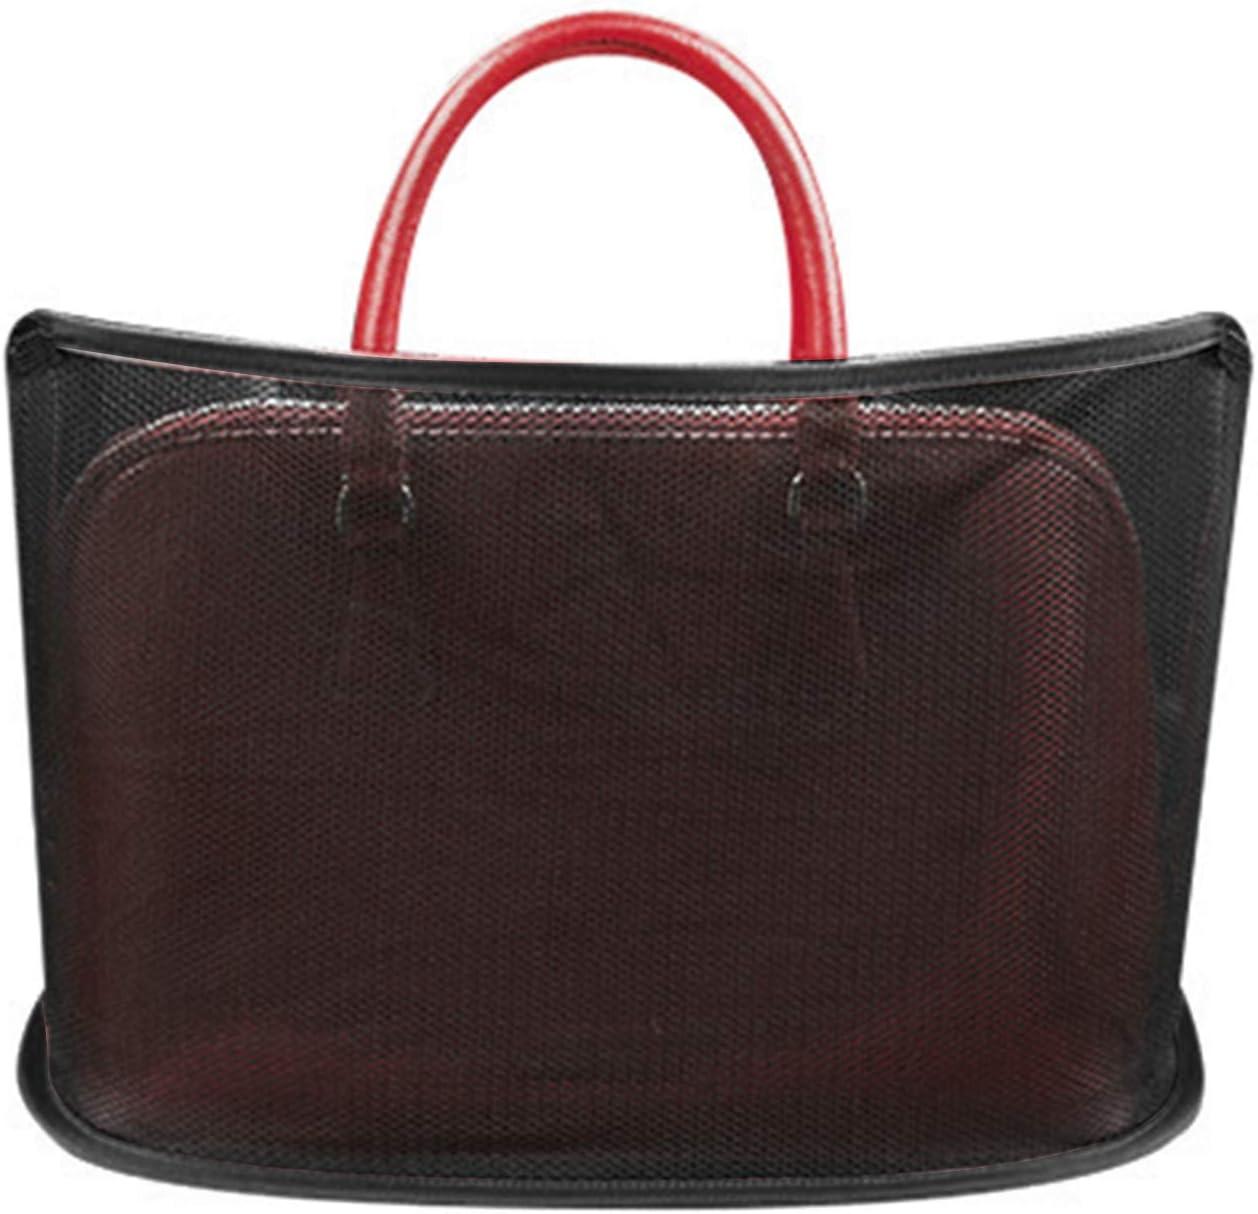 Universal Car Seat Storage Mesh//Organize for Handbag Bag Documents Phone Valuable Items Car Net Pocket Handbag Holder Upgraded Car Seat Storage Net Bag for Car